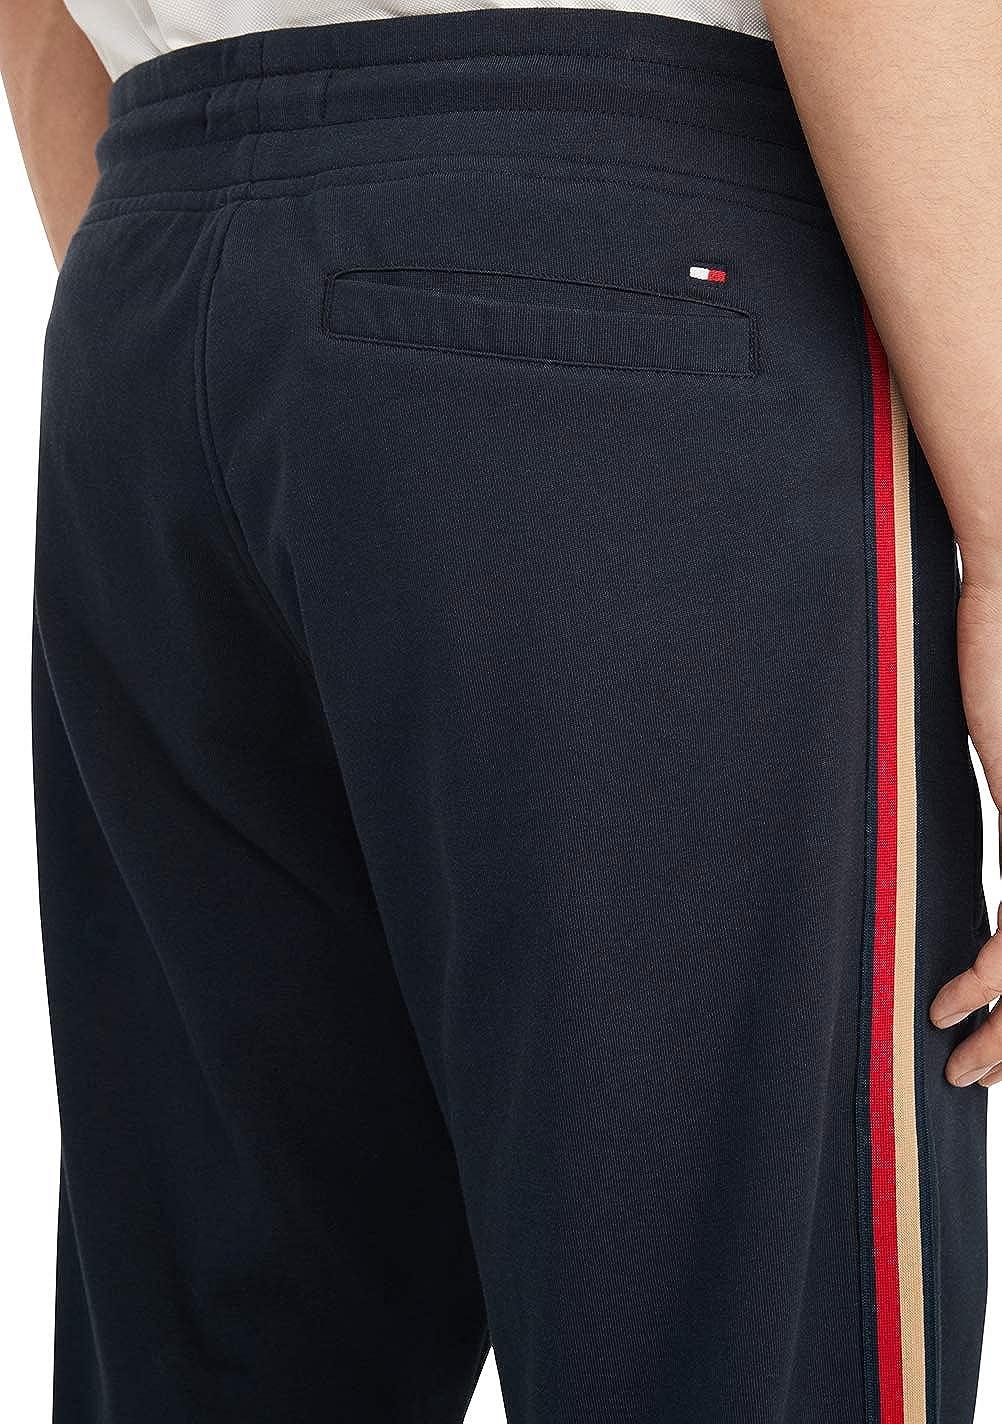 Tommy Hilfiger Mens Pant Track Pants